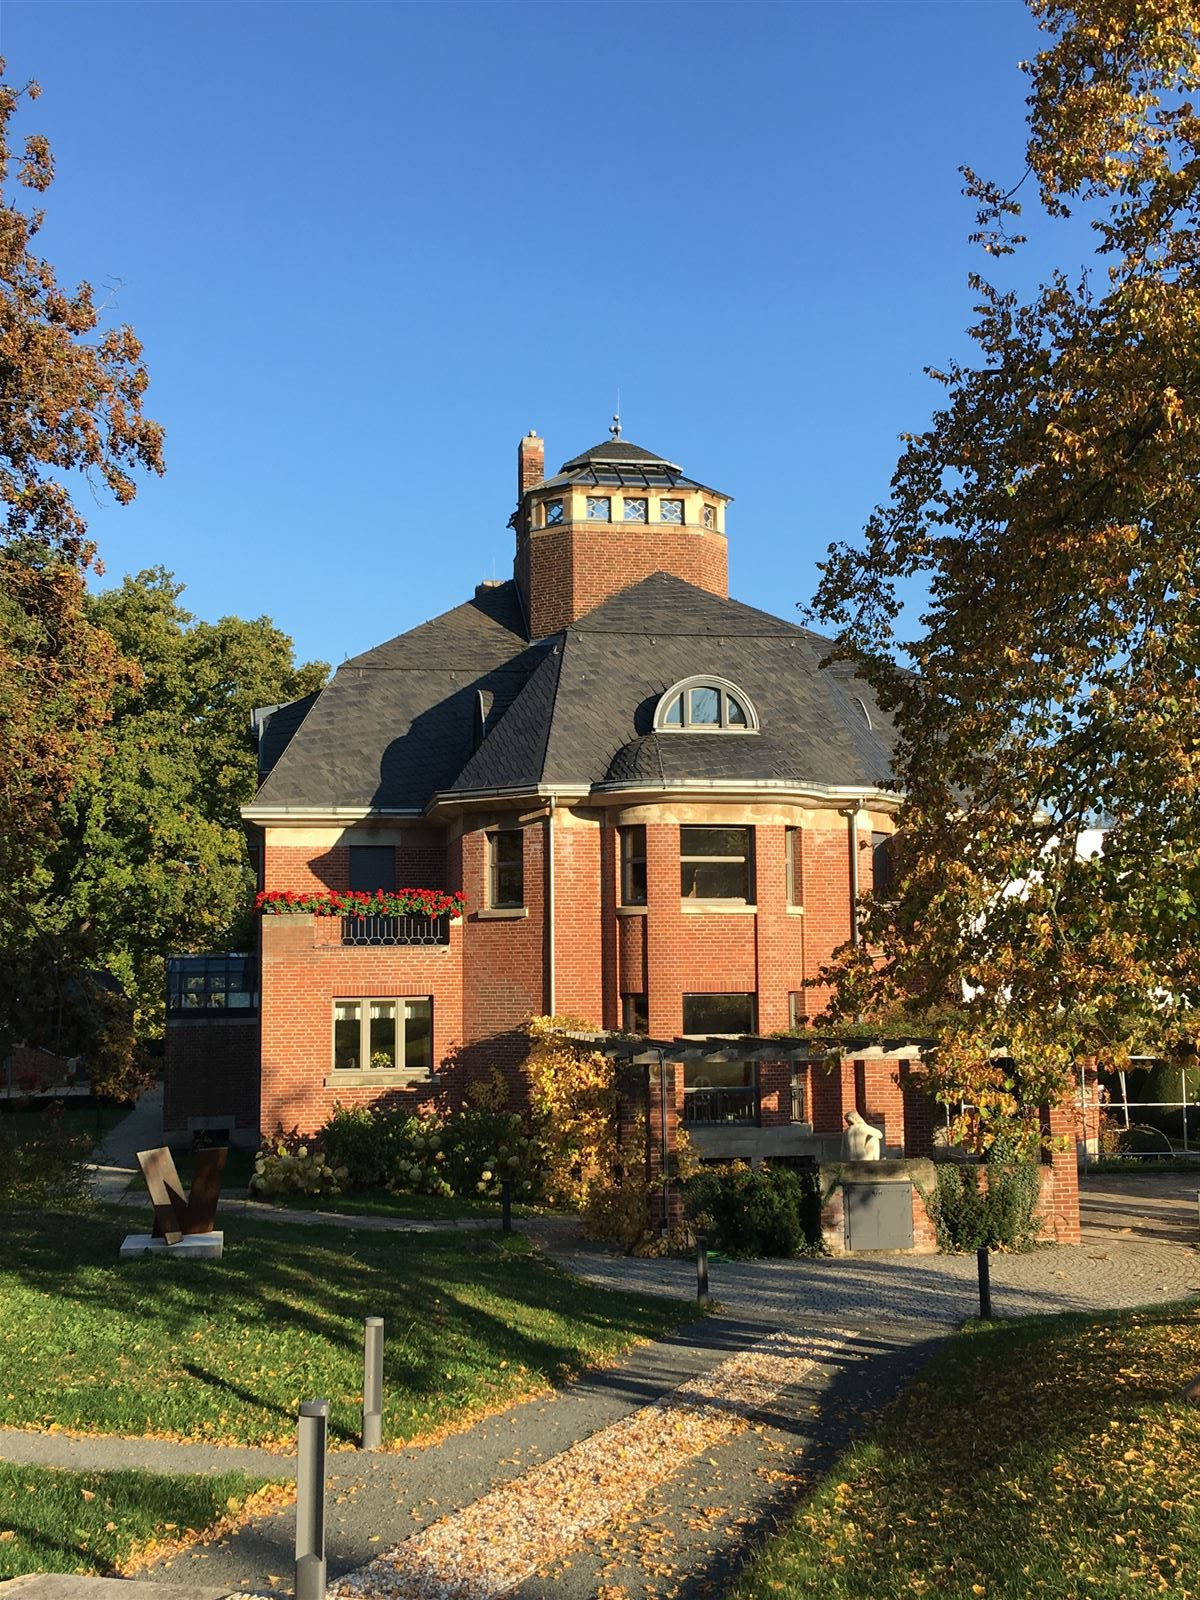 Ausflug - Haus Schulenburg von Henry van de Velde in Gera